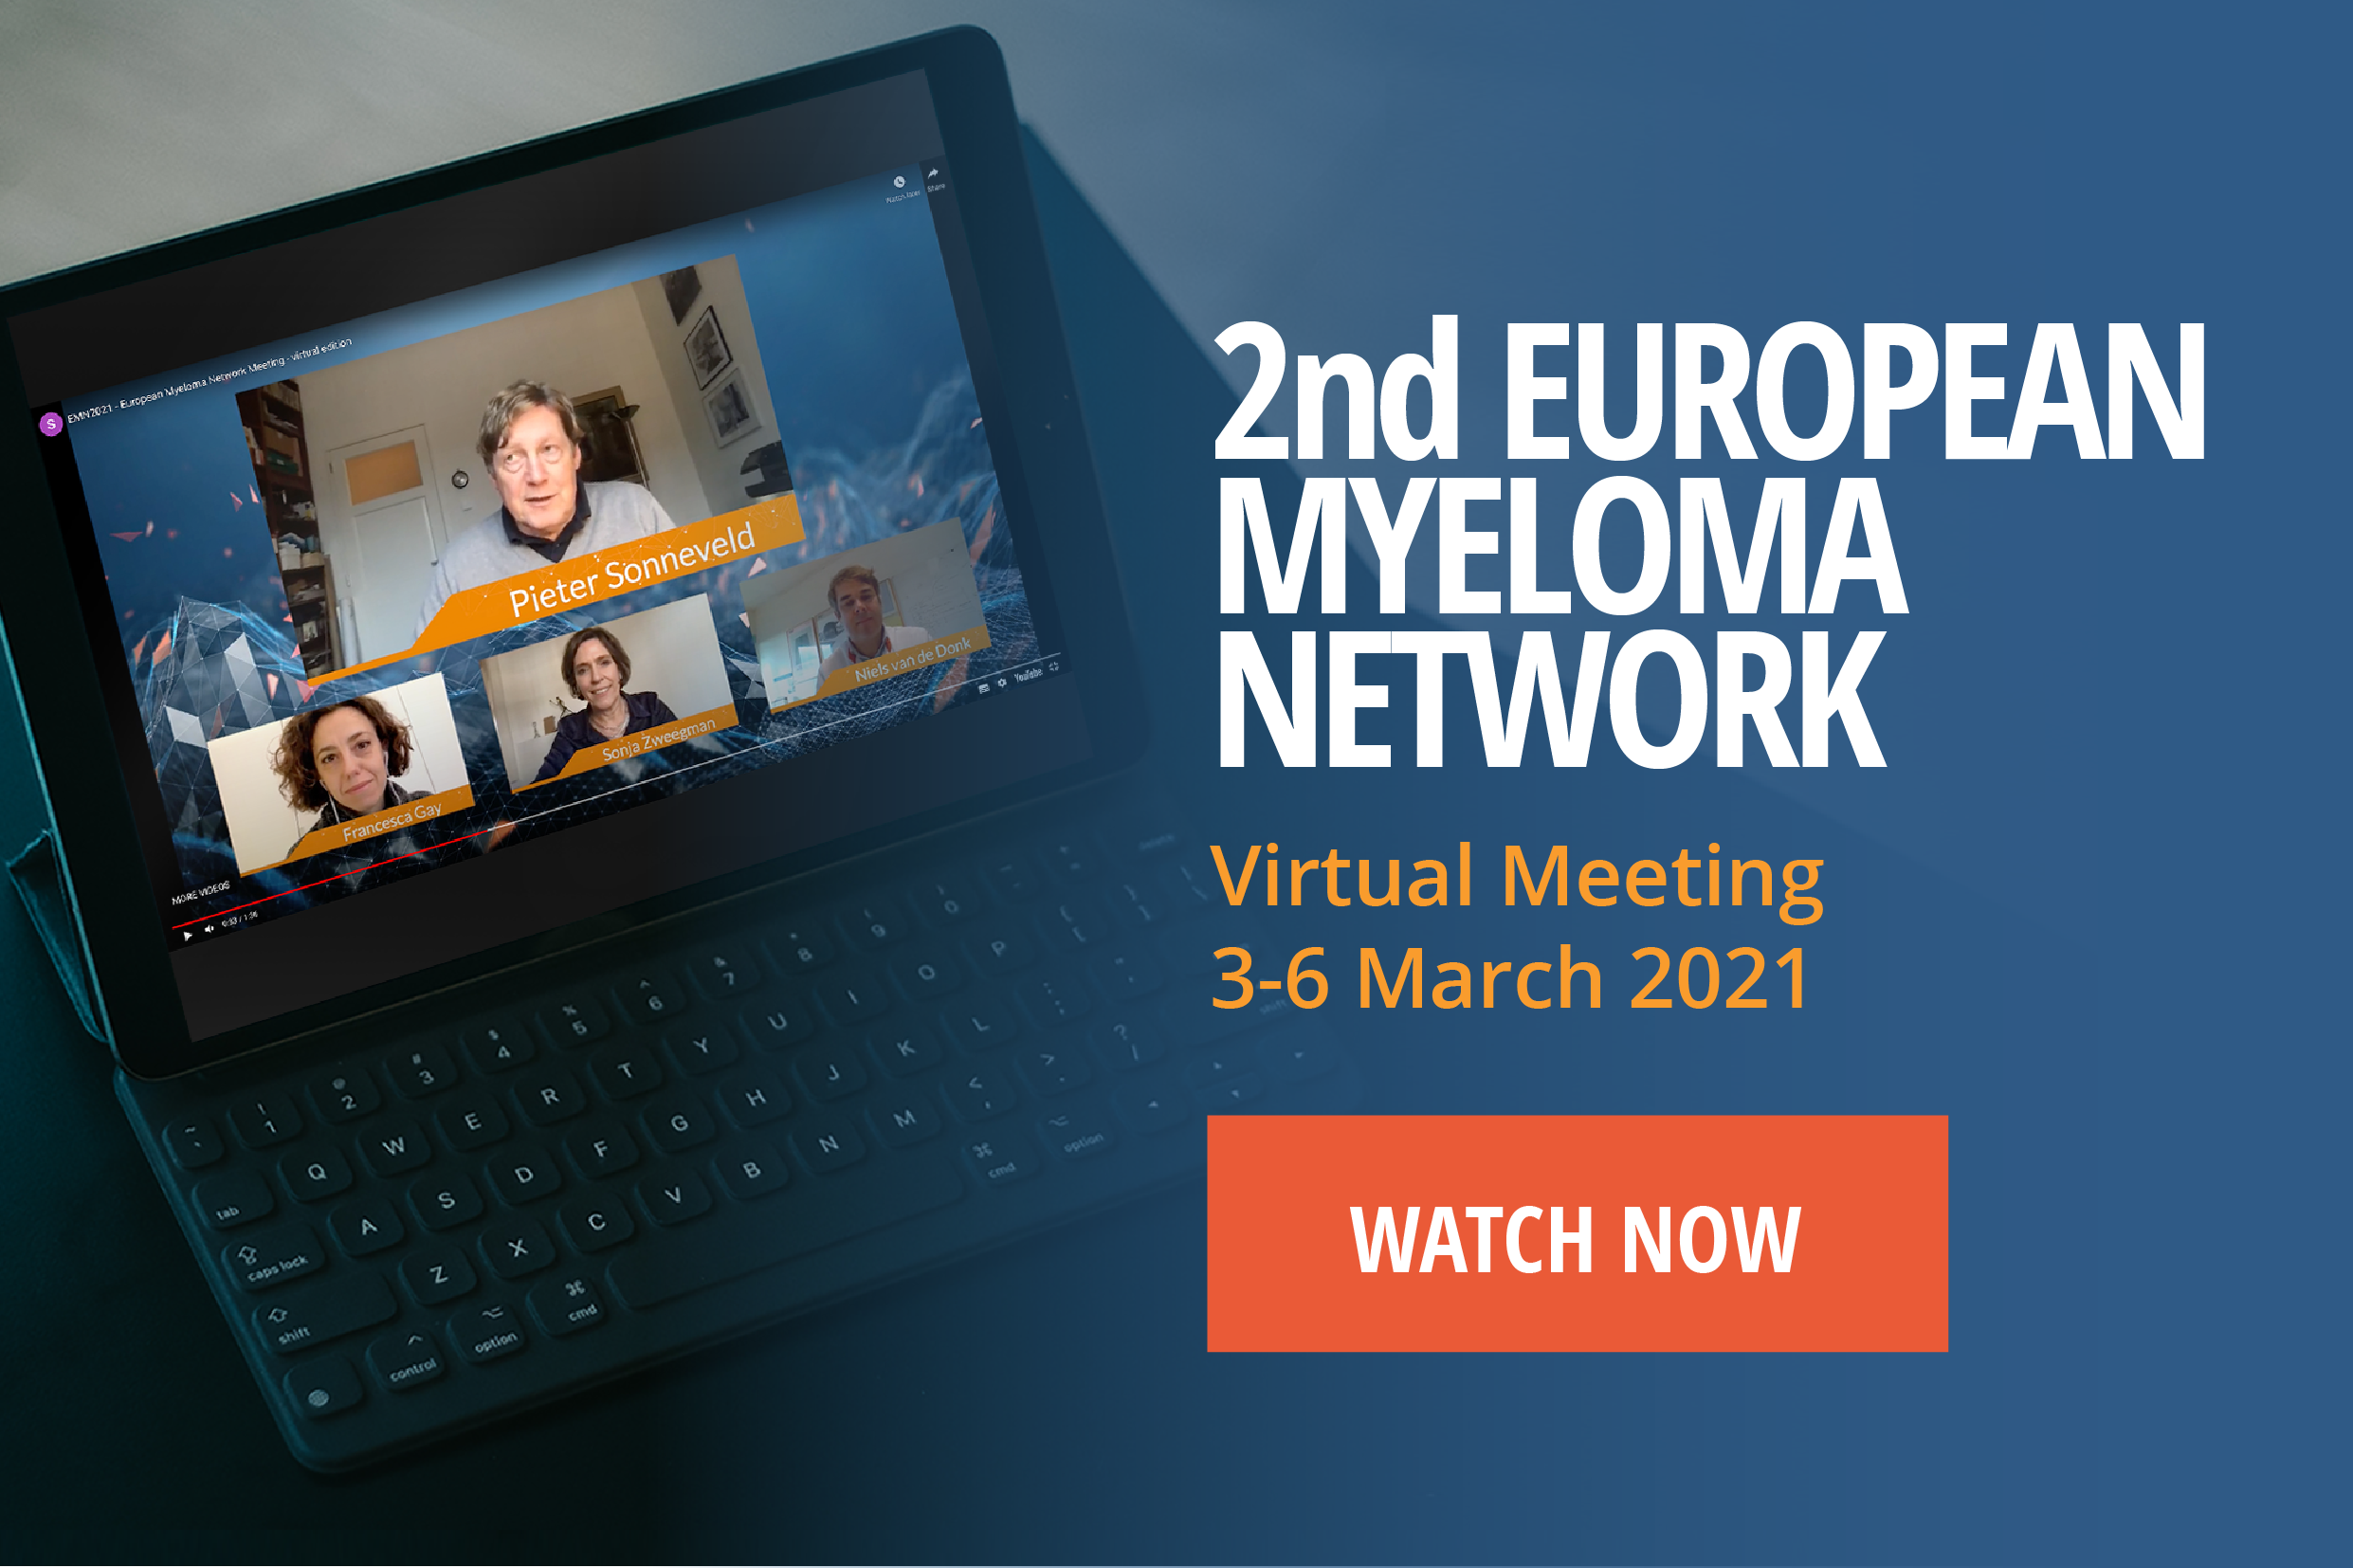 Watch VJHemOnc coverage of EMN 2021